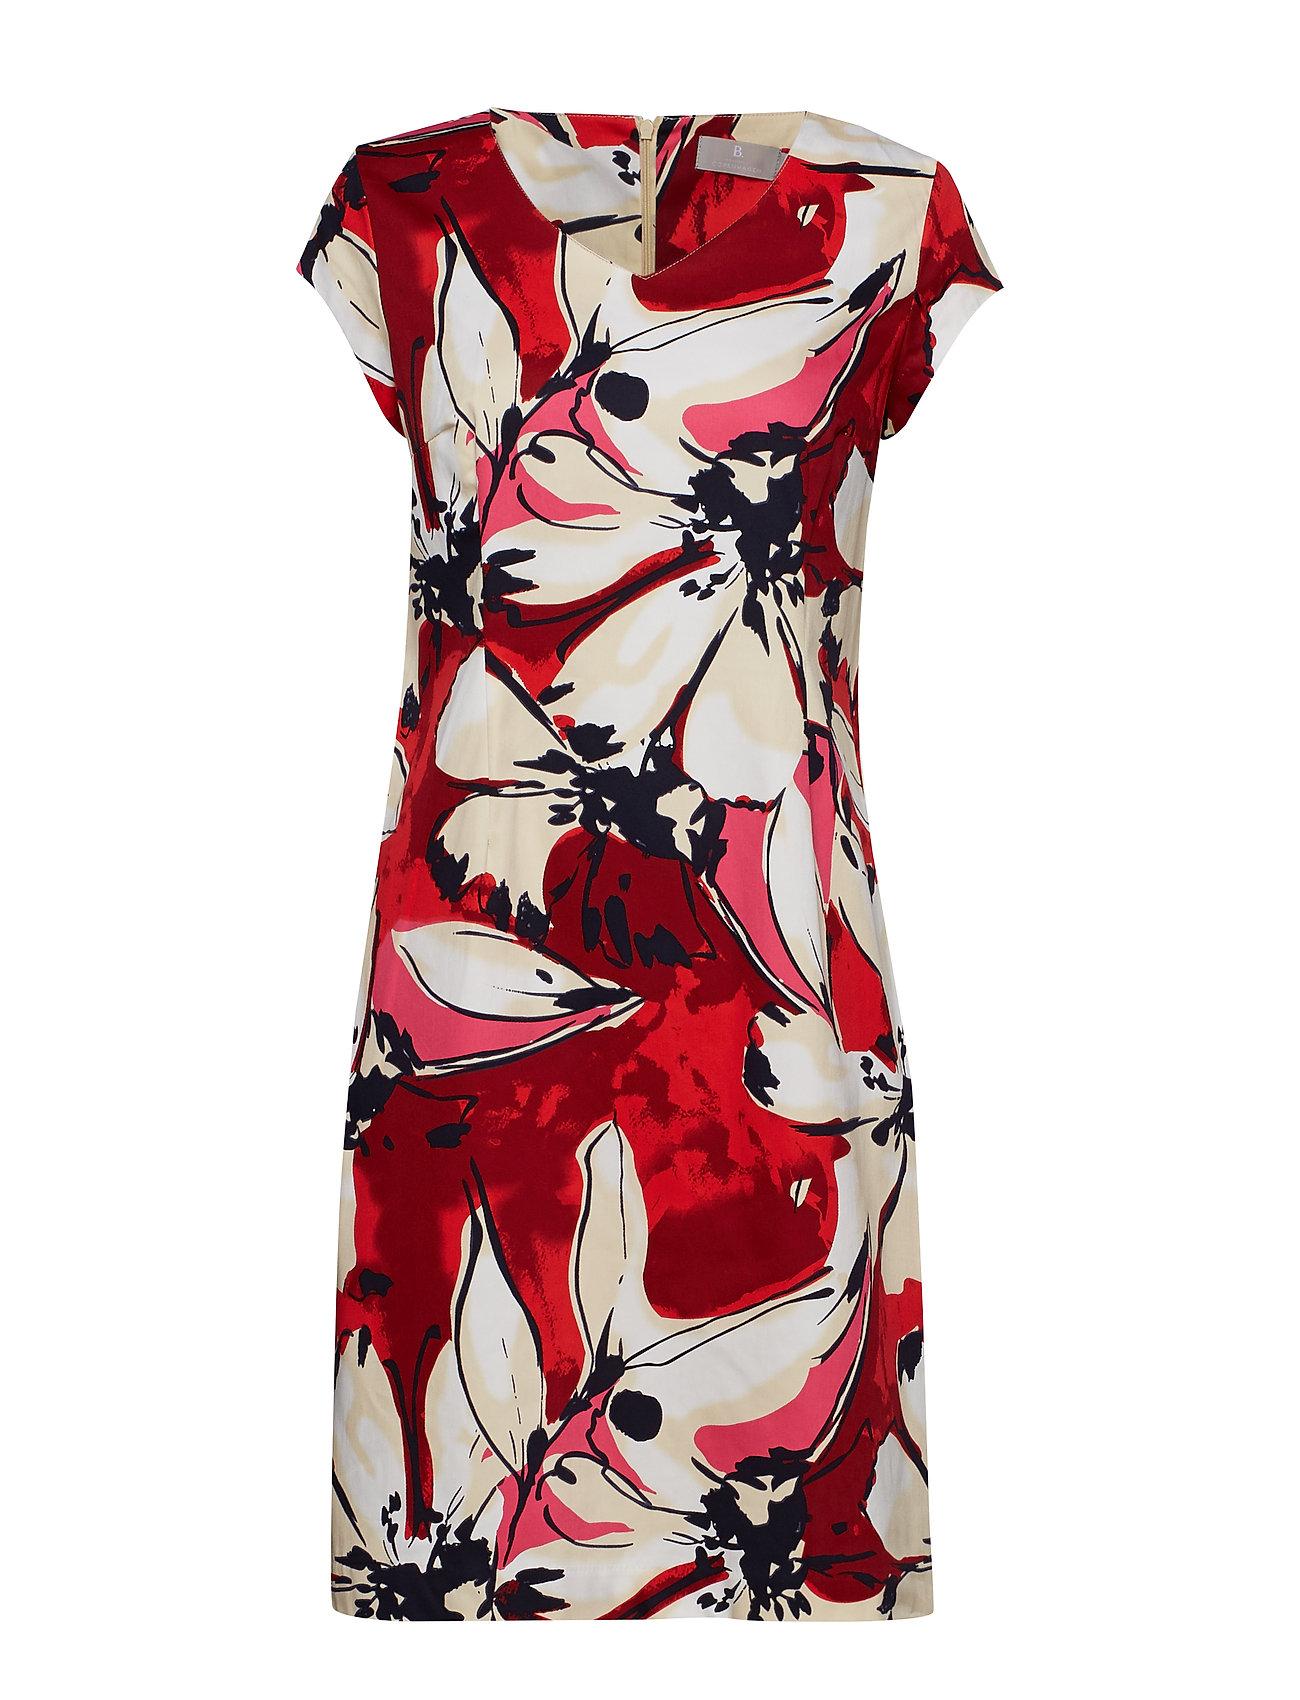 Brandtex Suiting dress - FIESTA RED